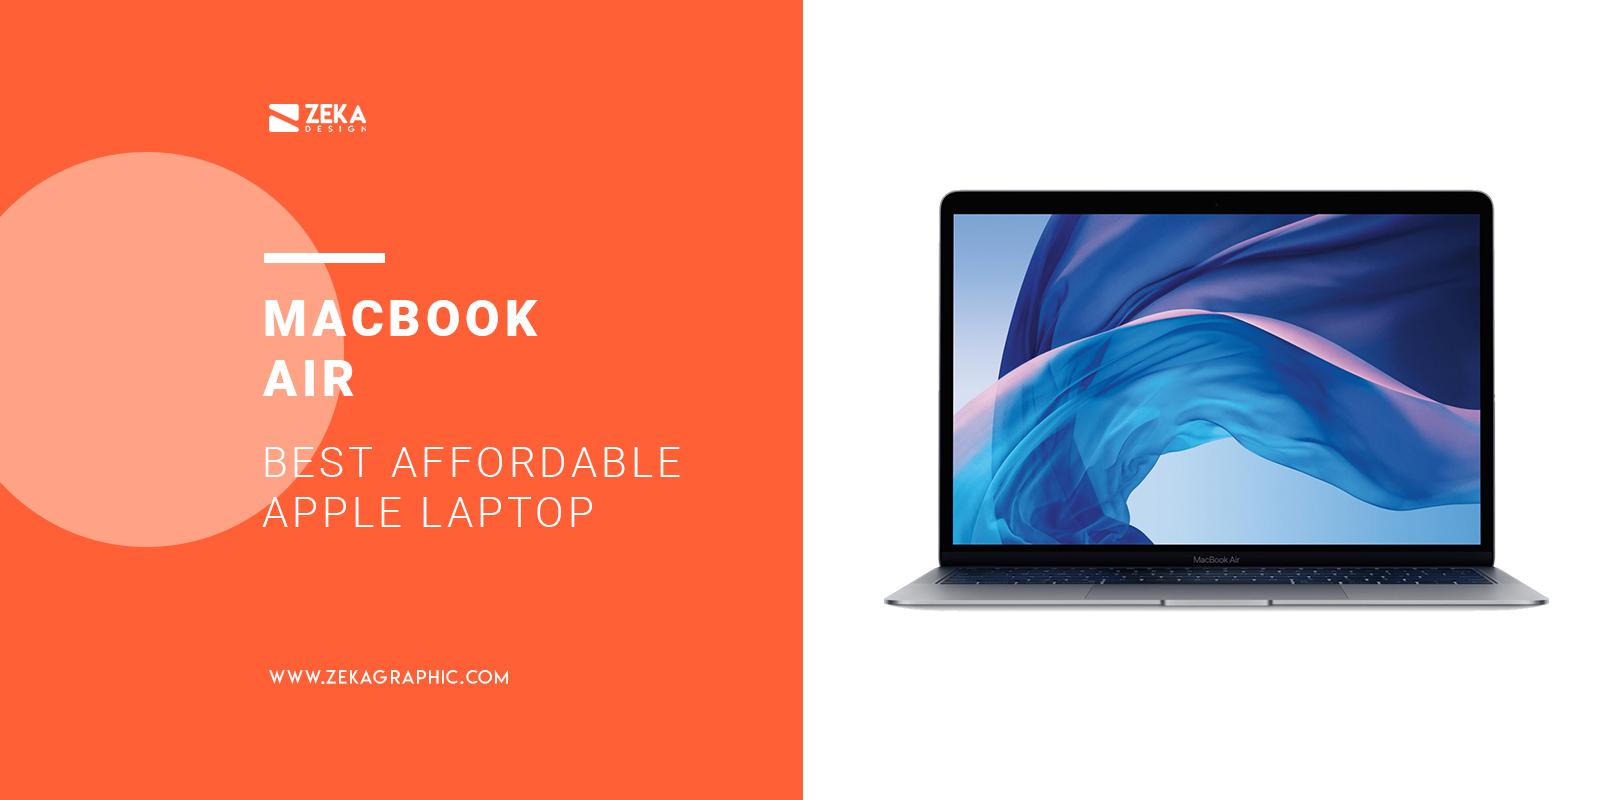 Apple MacBook Air Best Affordable Apple Laptop